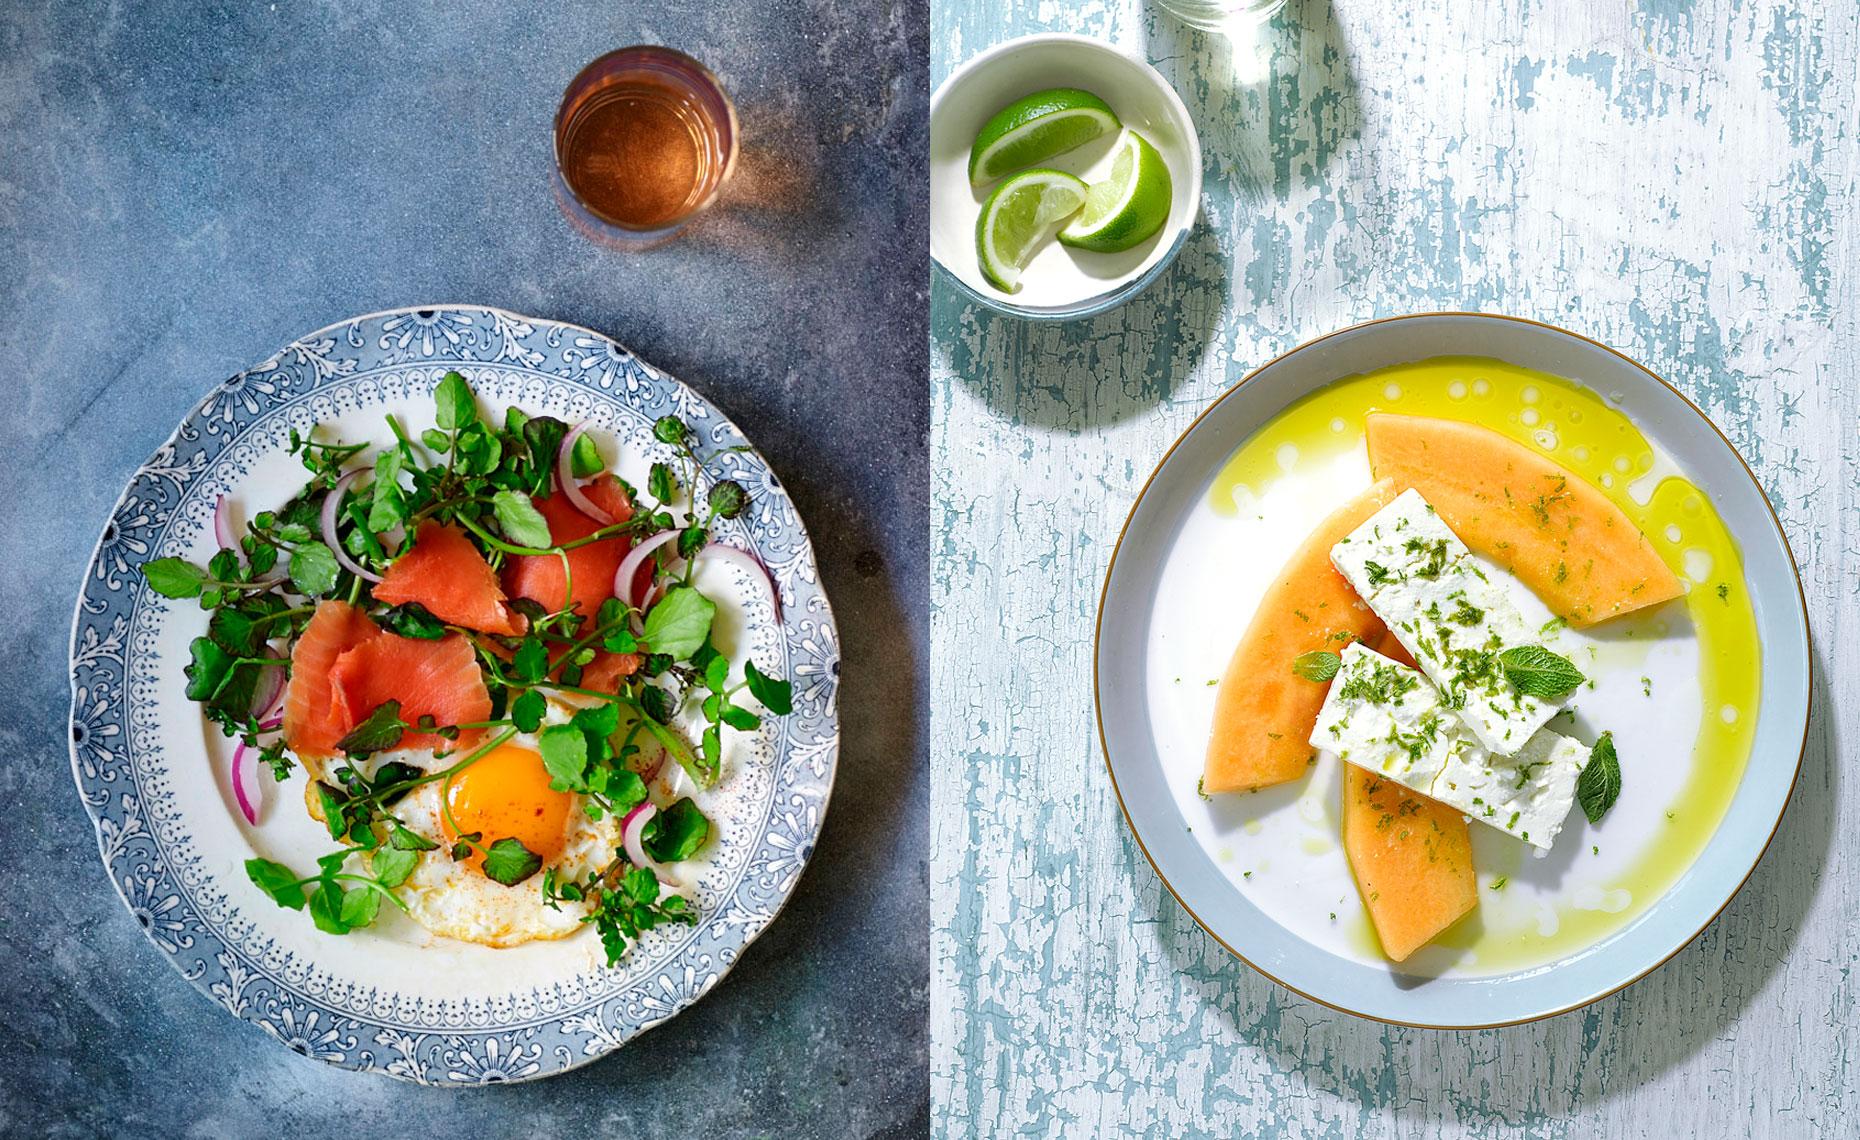 salmon-egg-salad-and-feta-cantaloupe.jpg